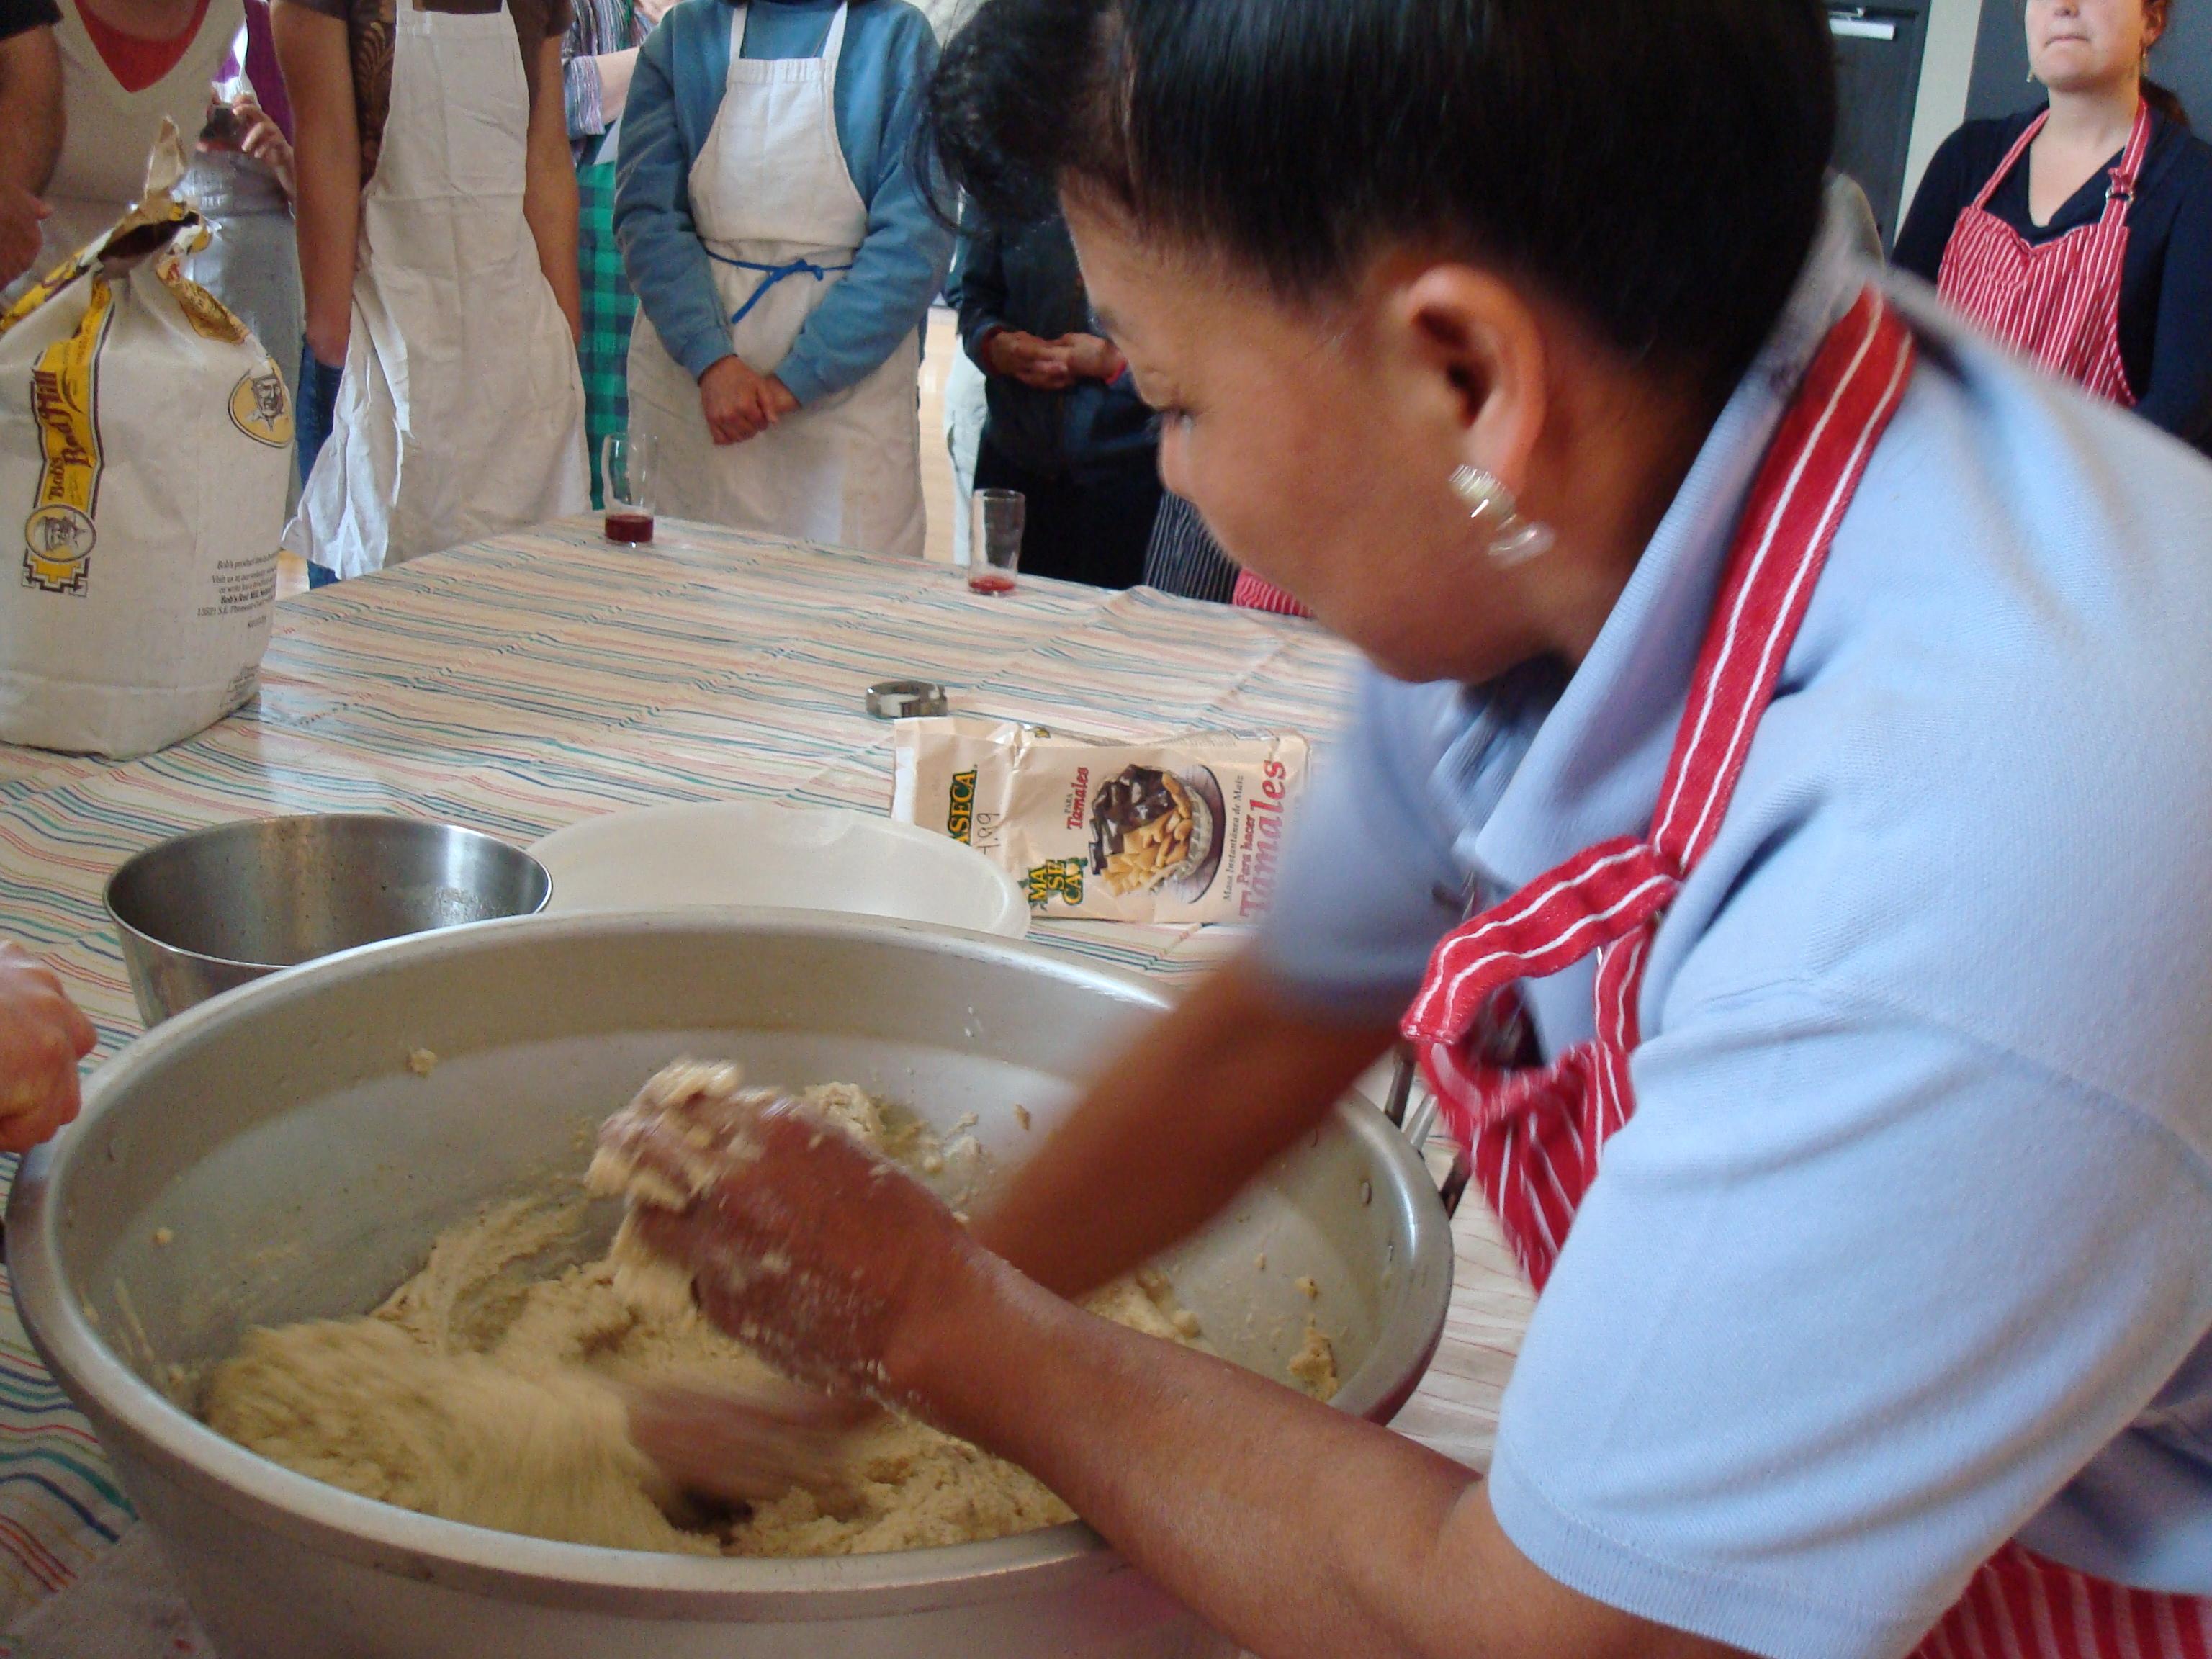 Texcoco native and veteran tamales maker Maria Ortiz demonstrates how to knead the masa dough.